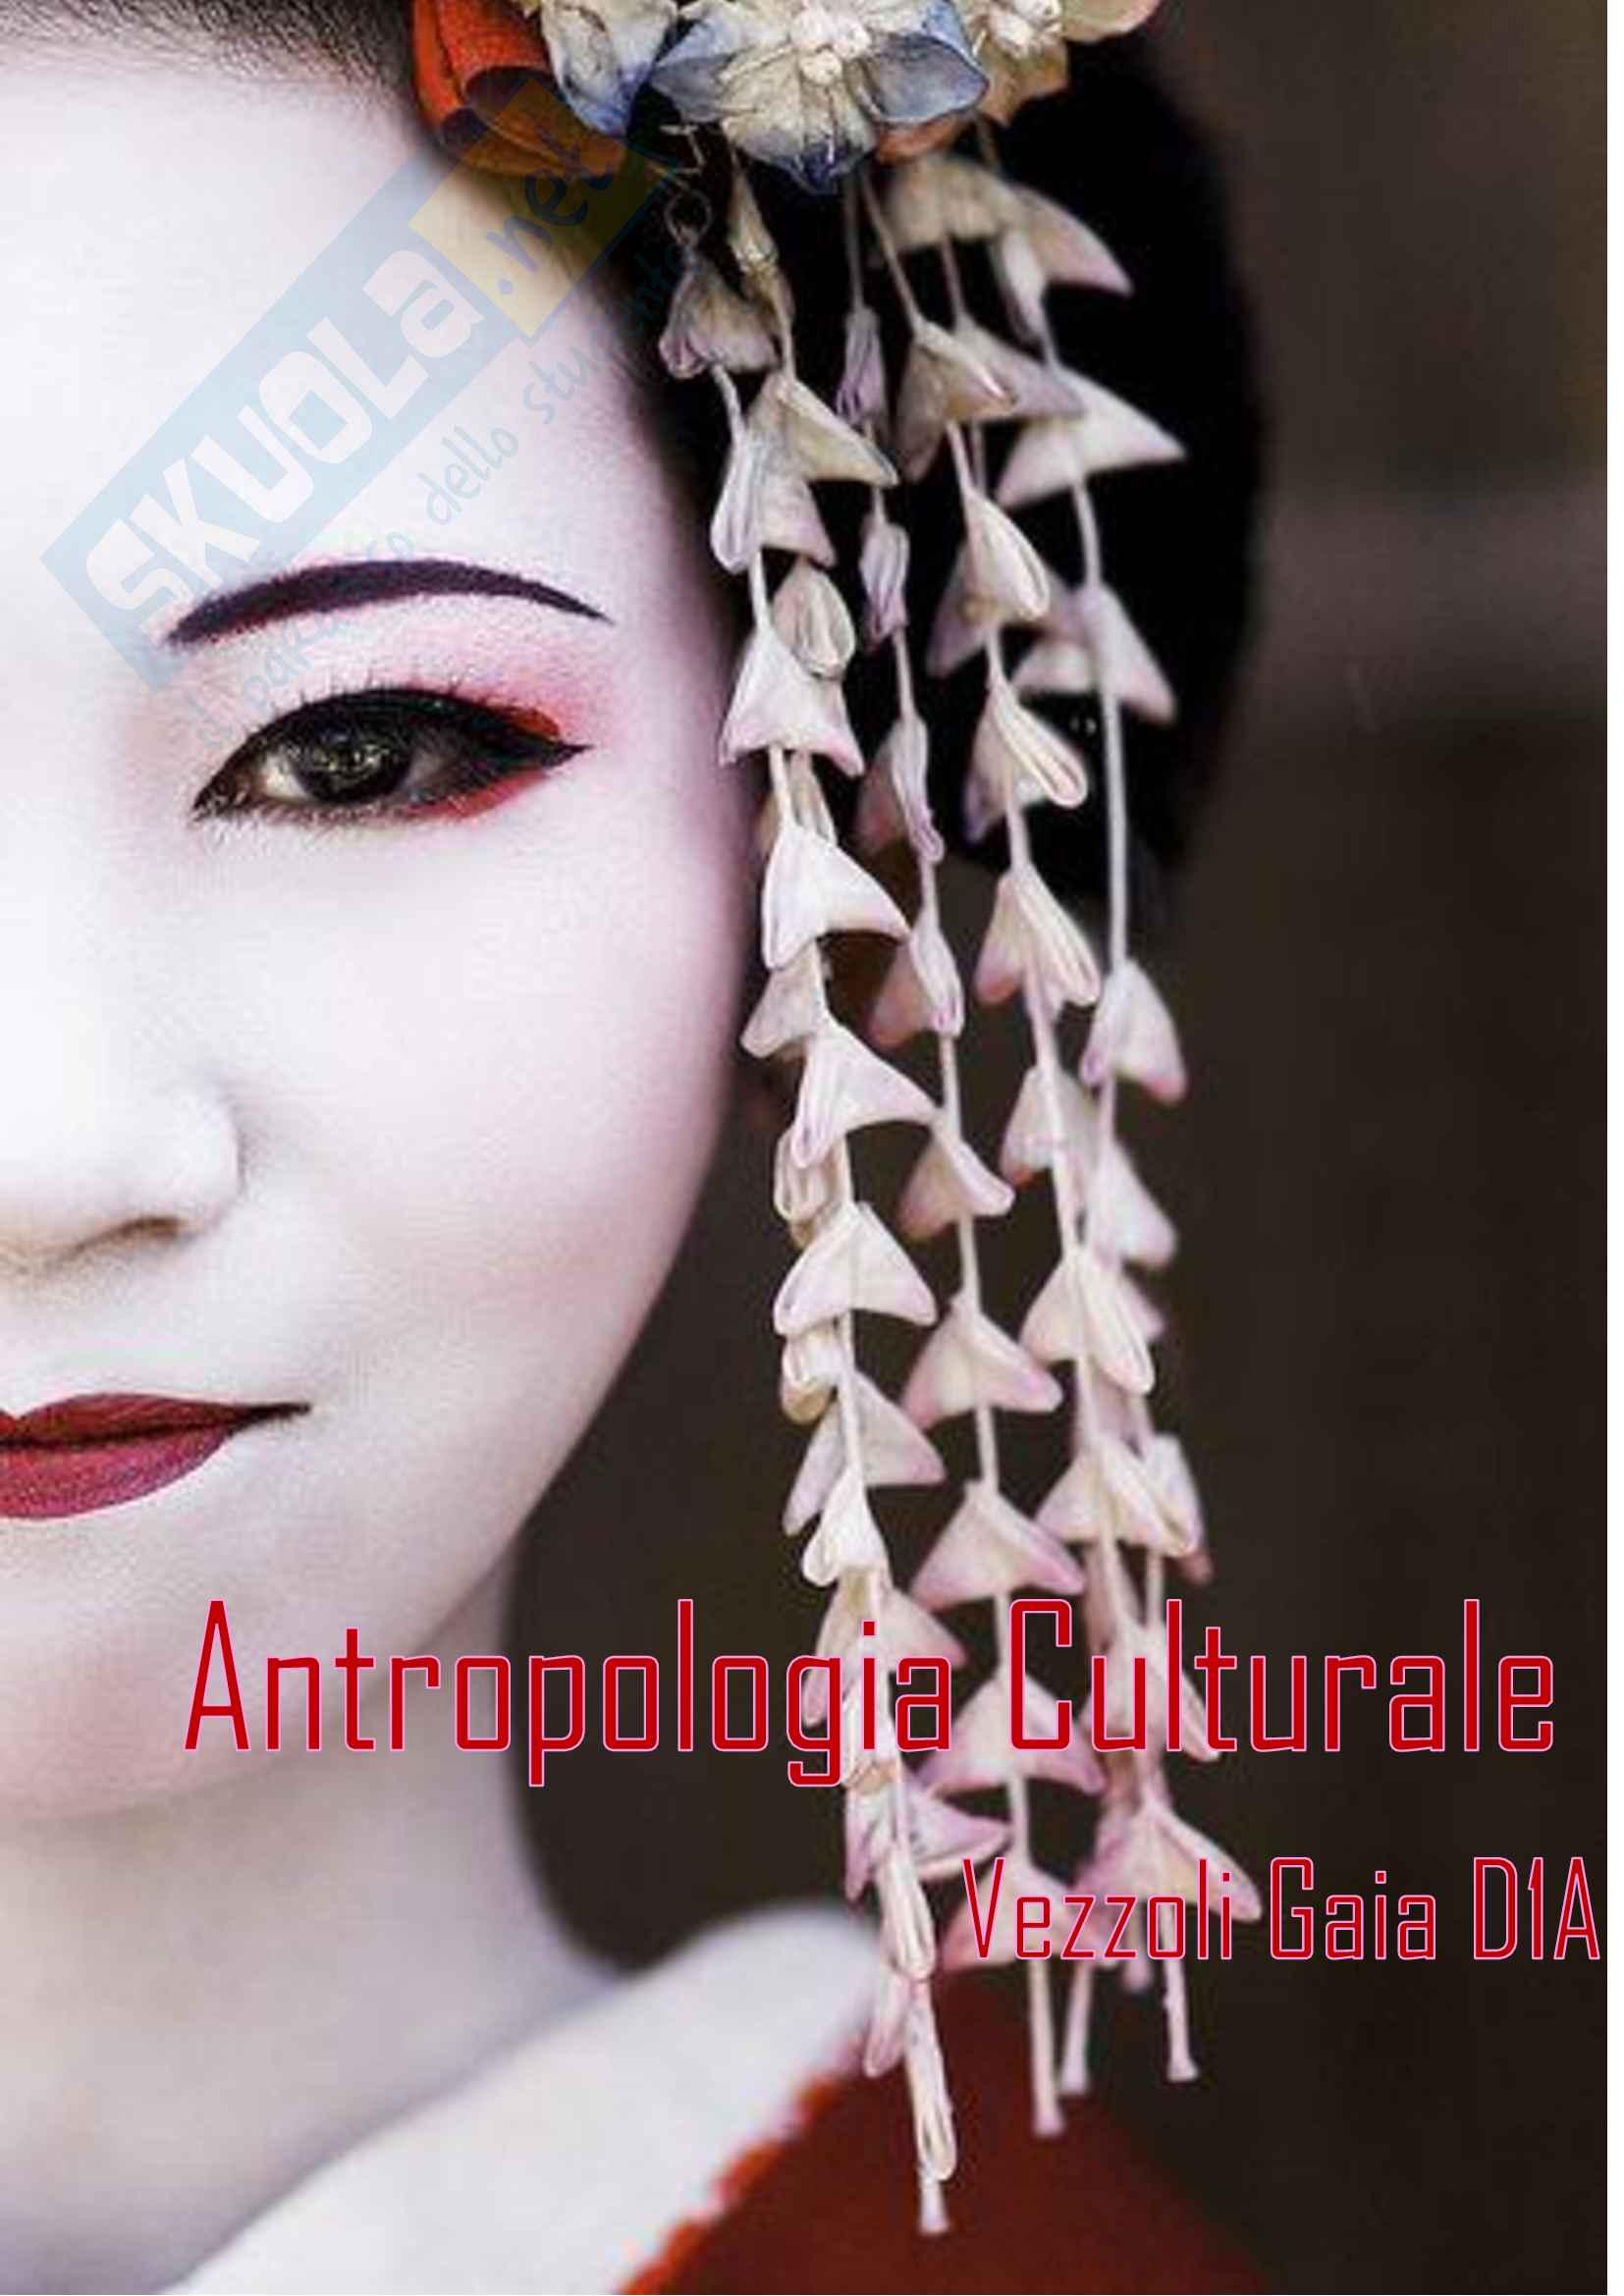 Antropologia culturale: appunti